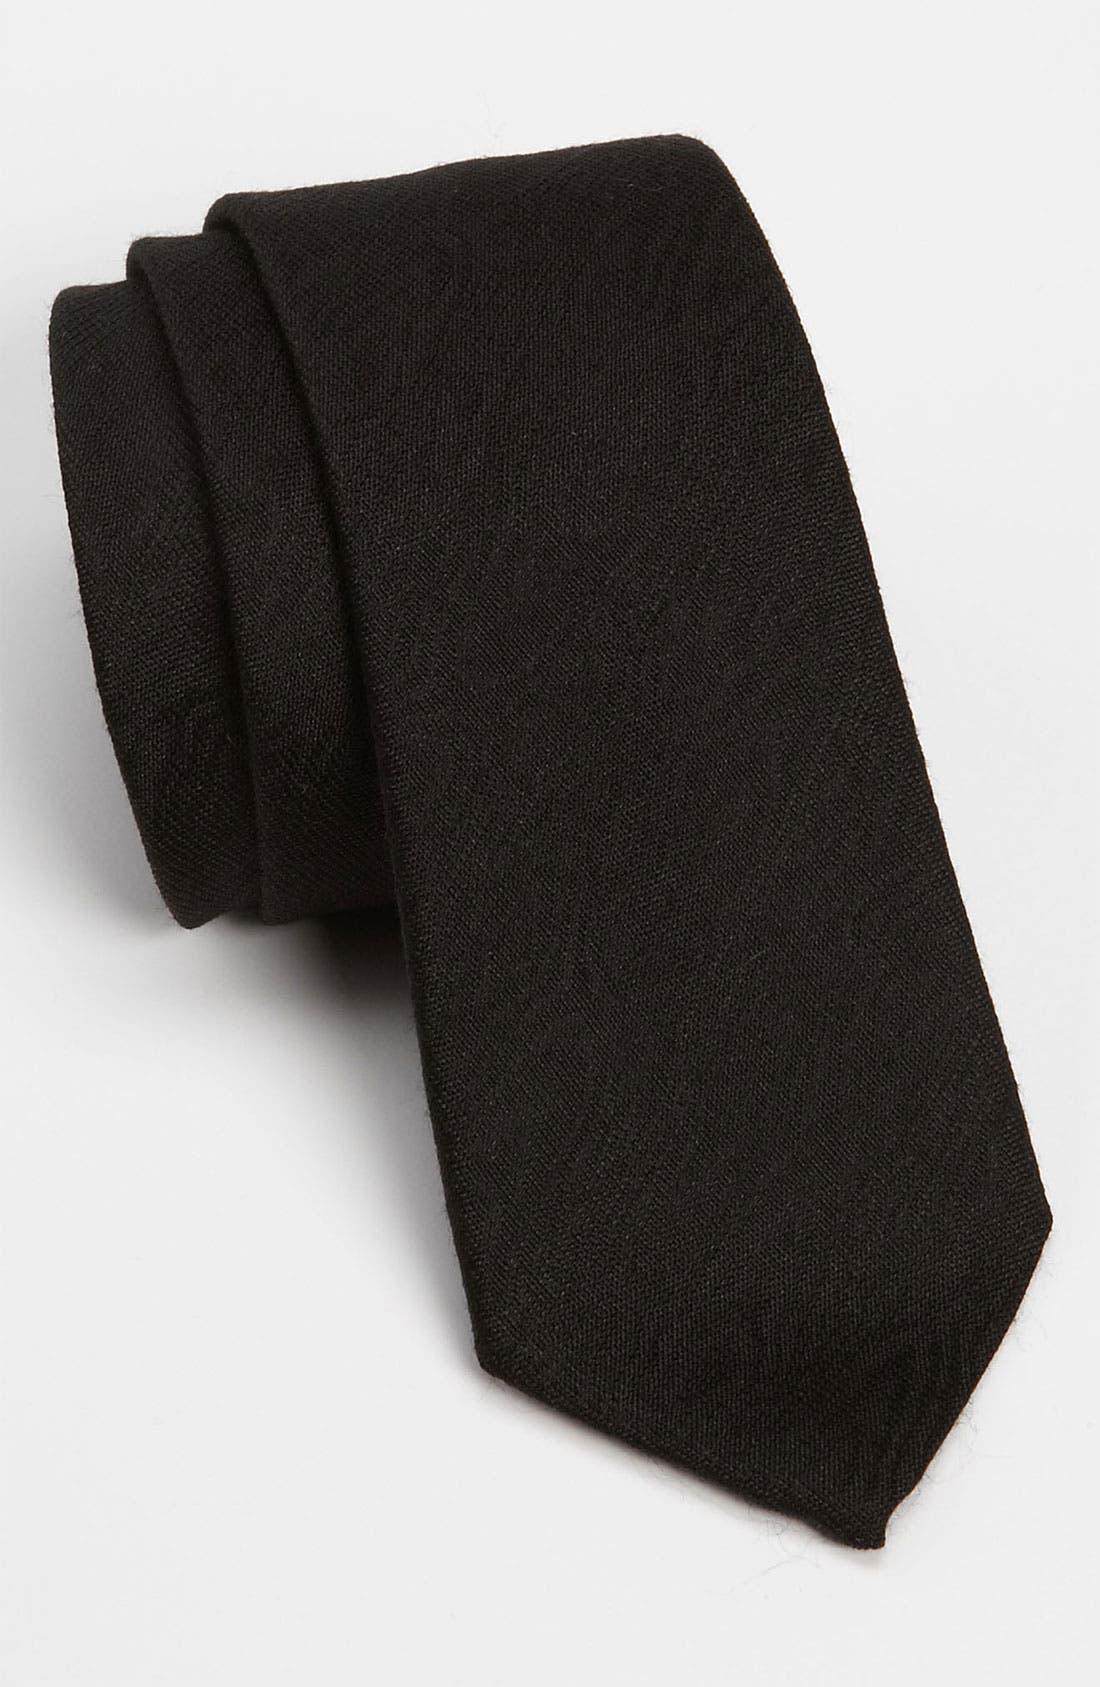 Main Image - Dolce&Gabbana Woven Tie